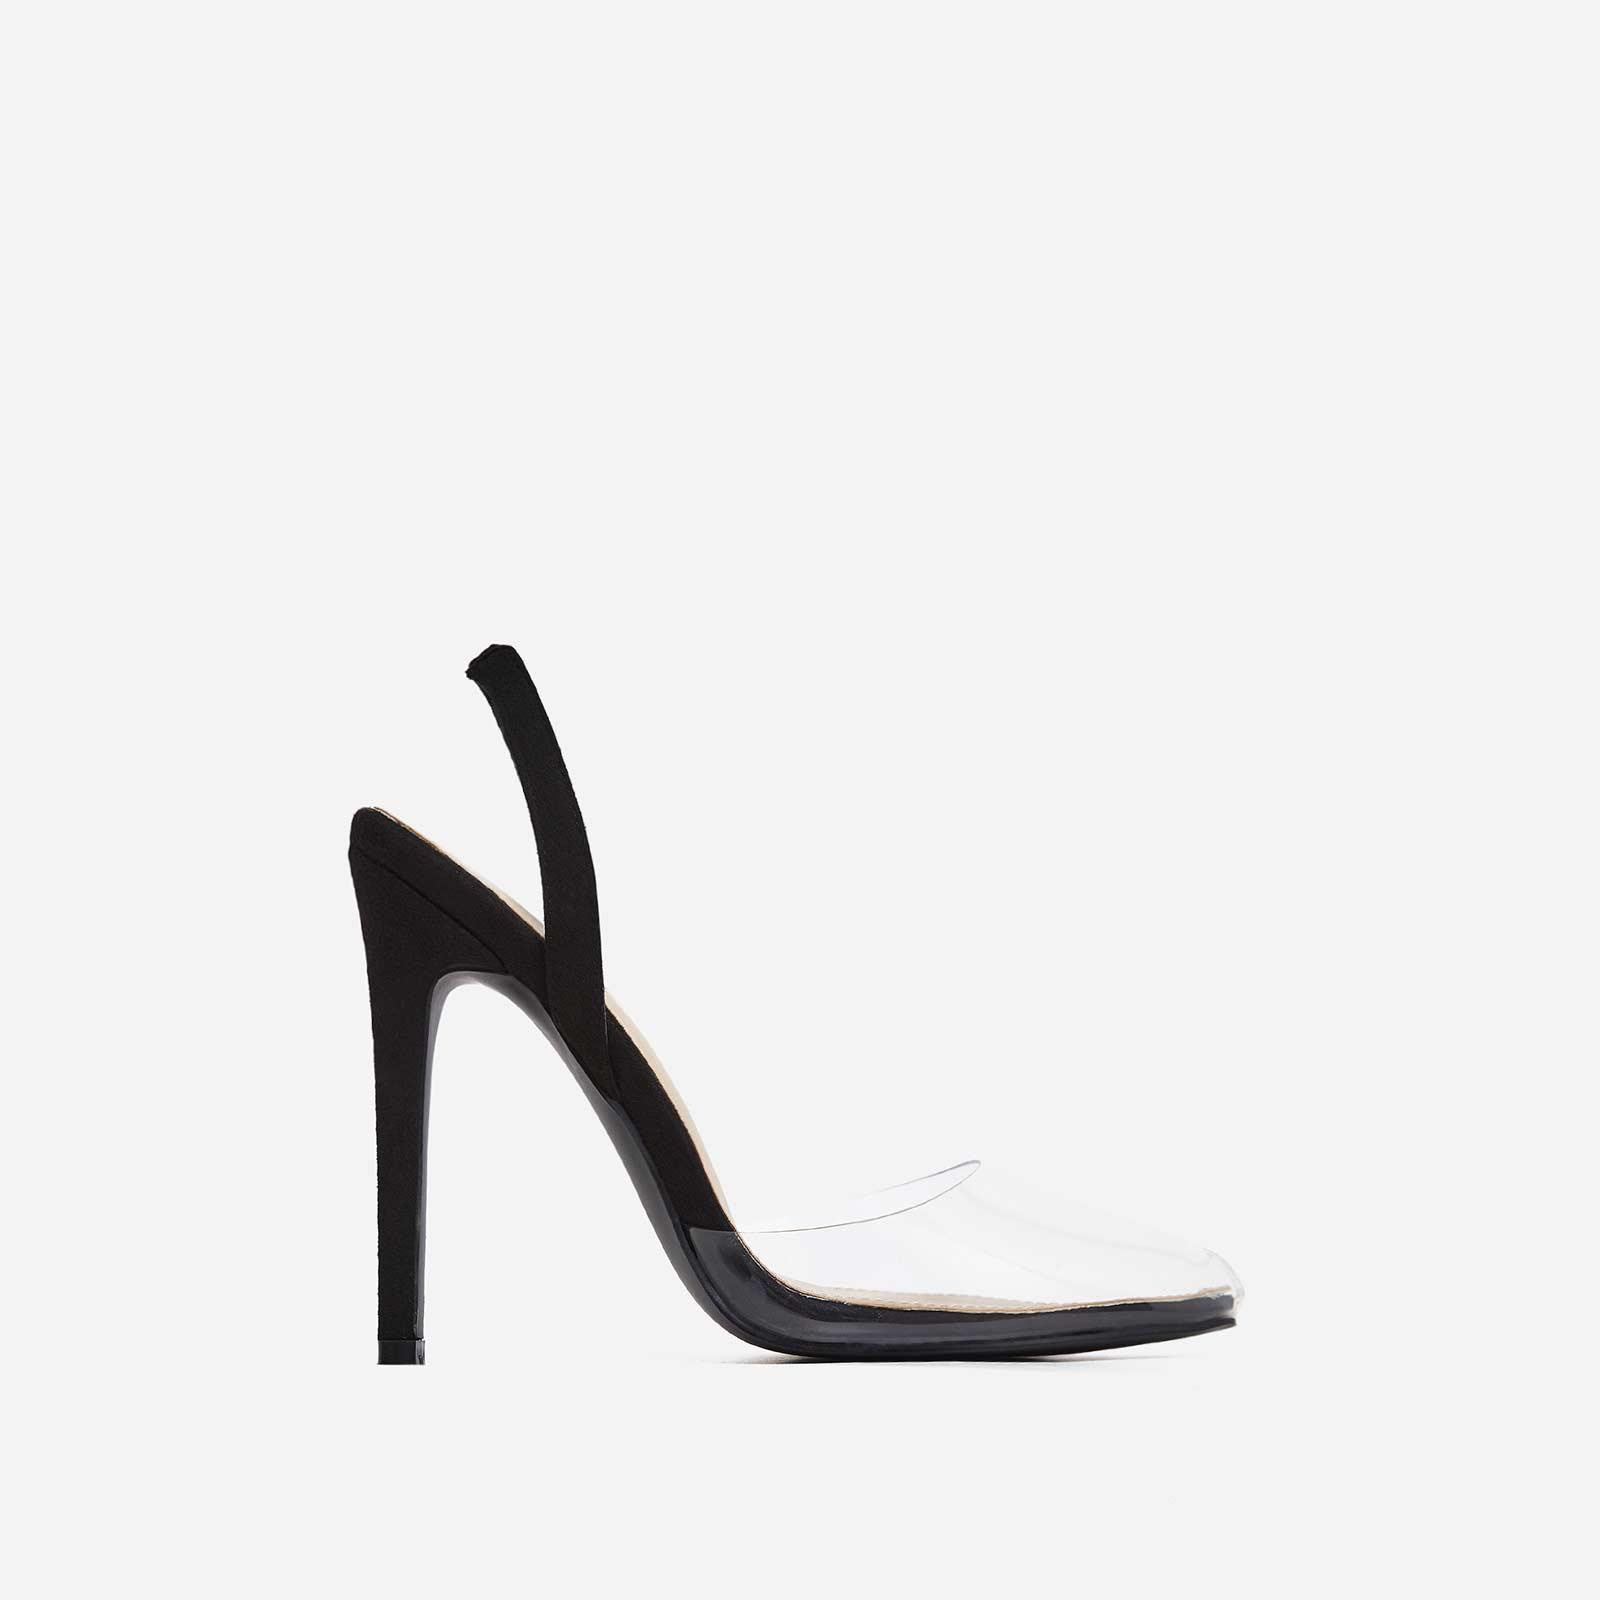 Cape Perspex Heel In Black Faux Suede